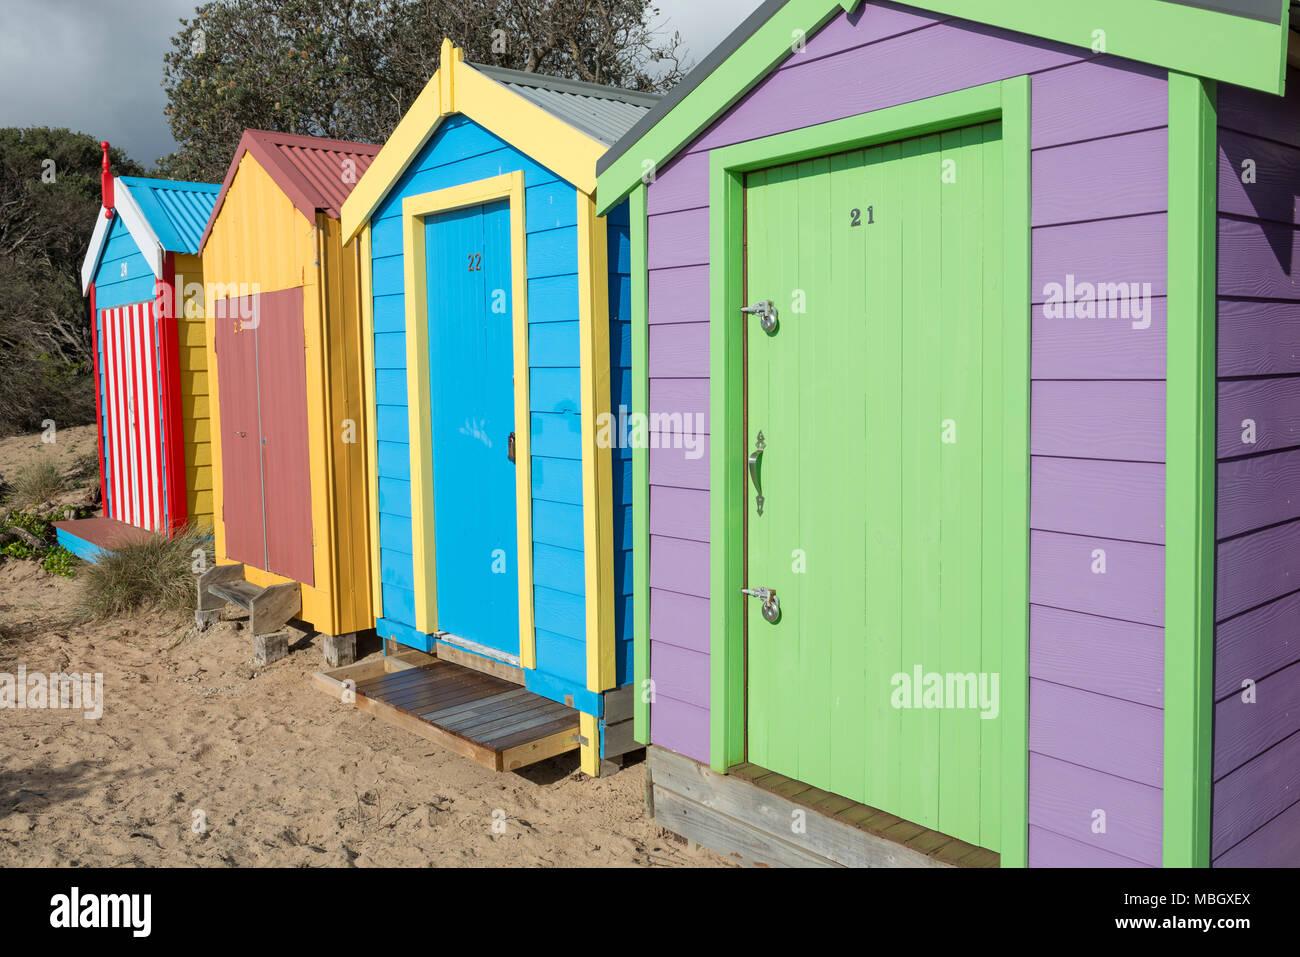 Victorian Beach Huts Stock Photos & Victorian Beach Huts Stock ...